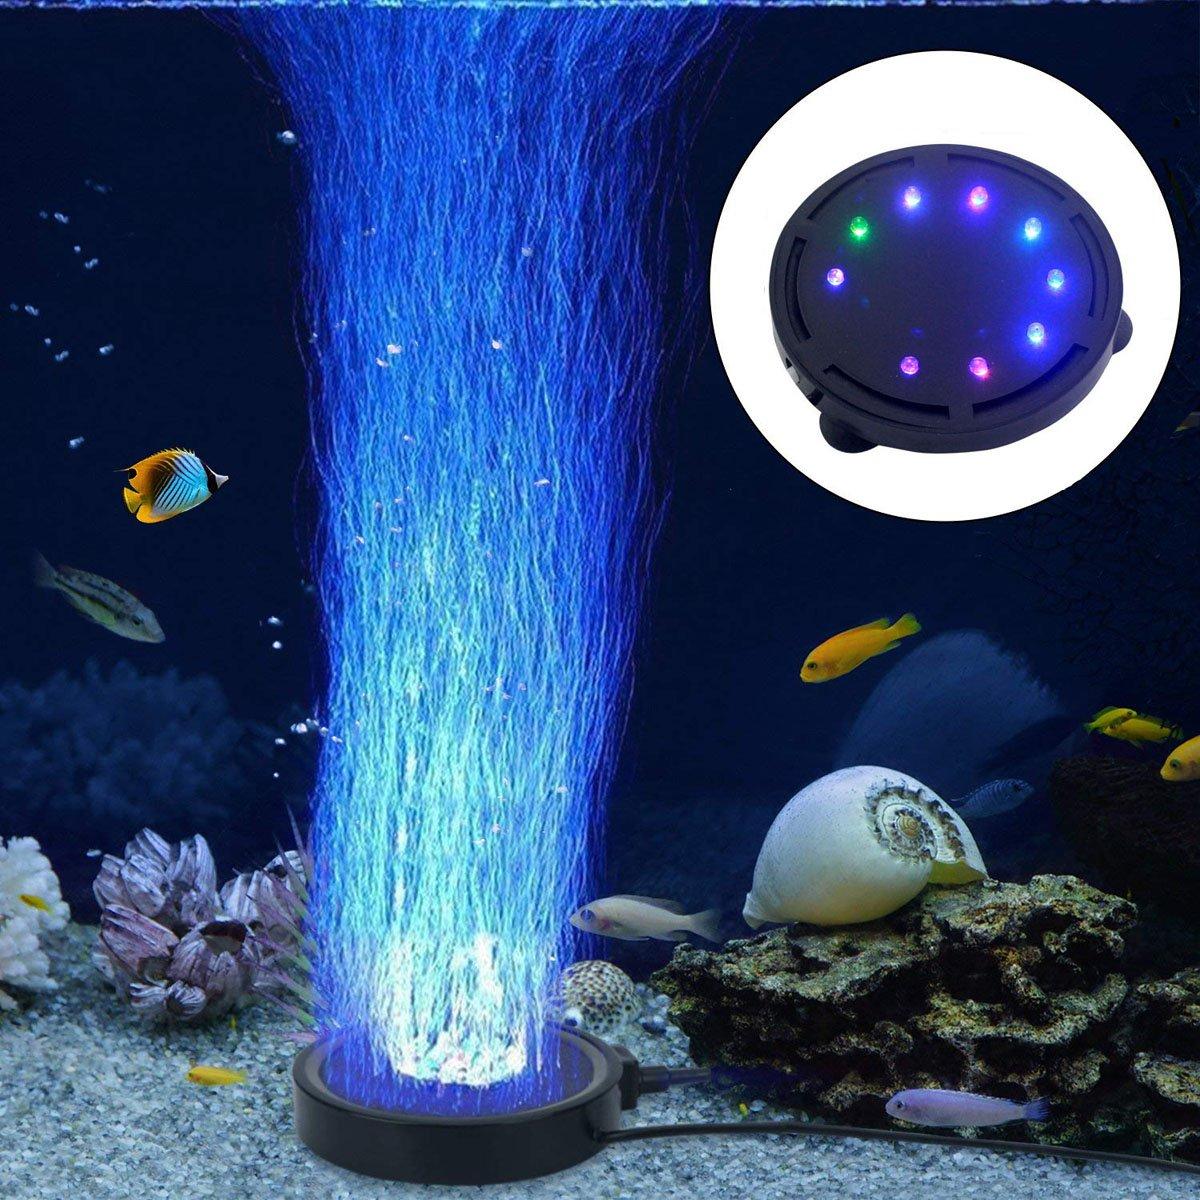 LONDAFISH Aquarium Bubble Light Aquarium Air Stone LED Light Air Pump Bubble Stone Lamp